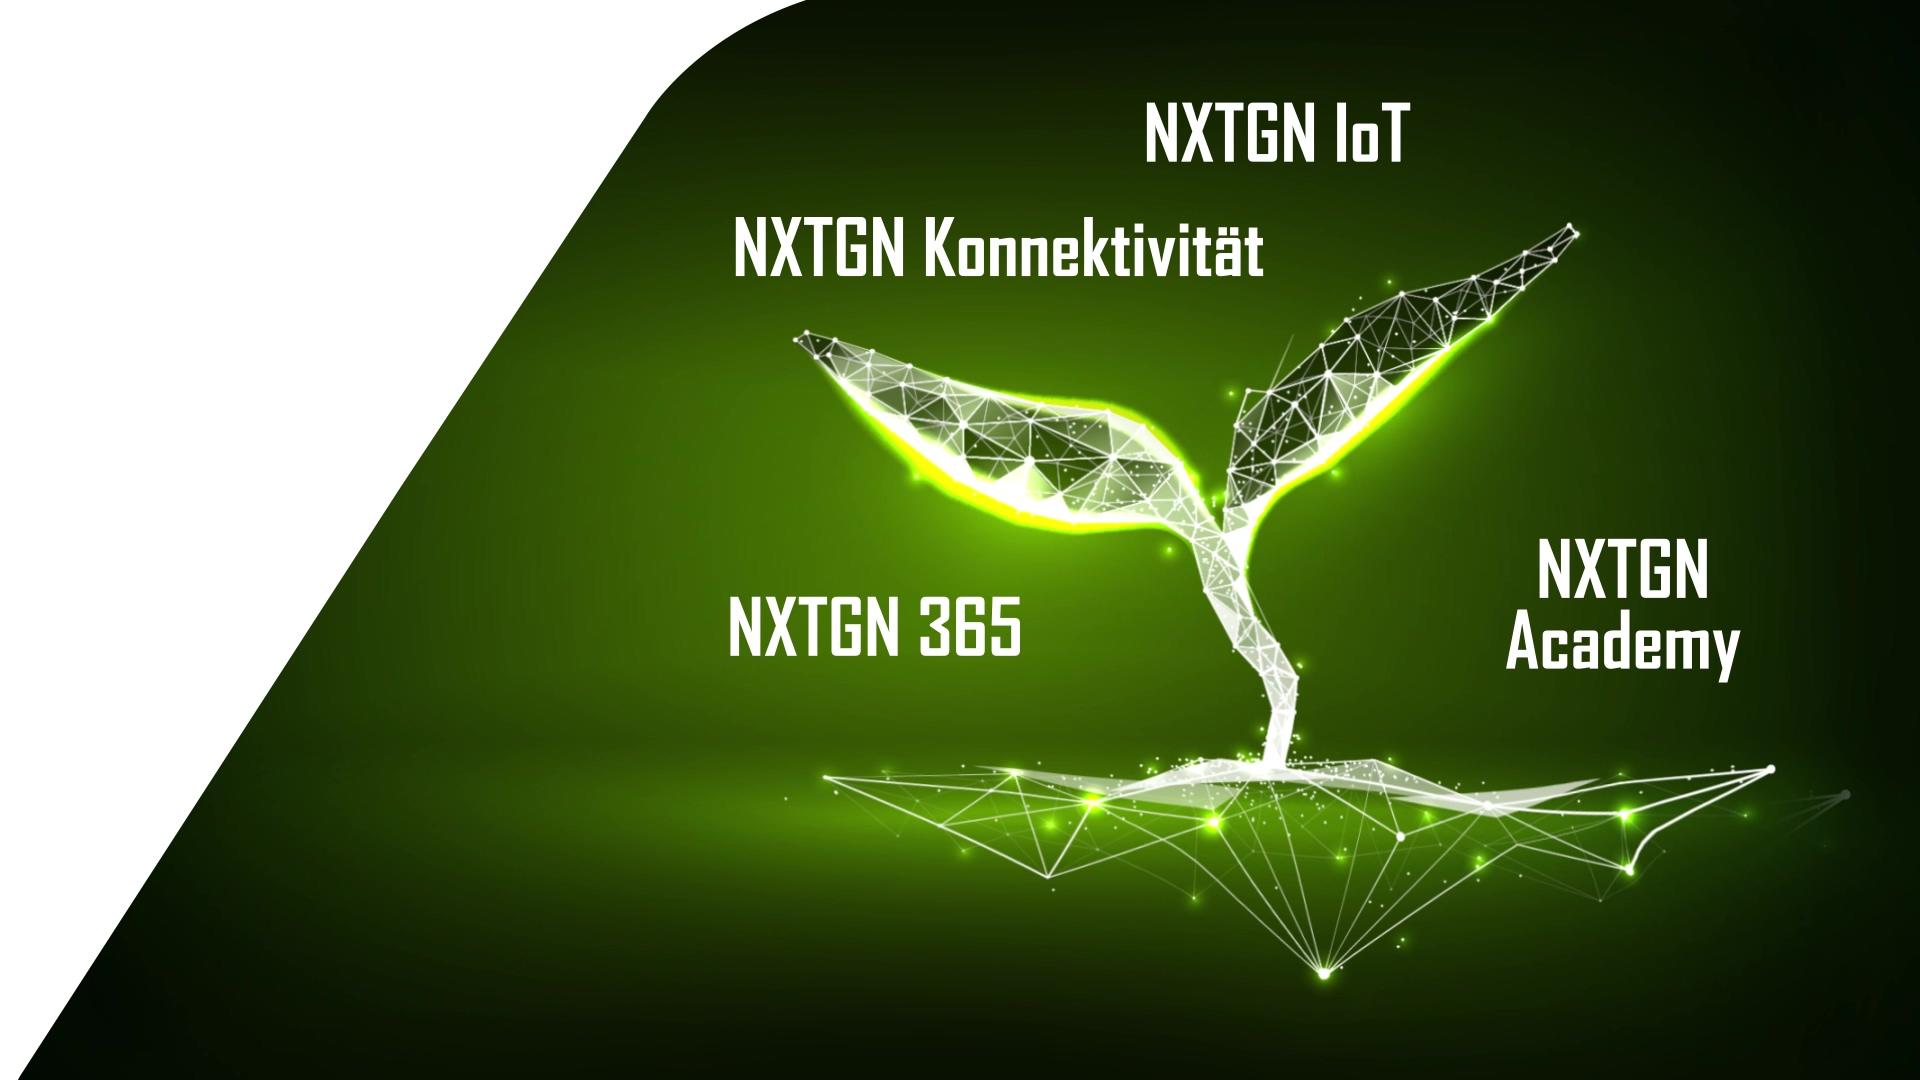 NXTGN-Company-4-Ebenen